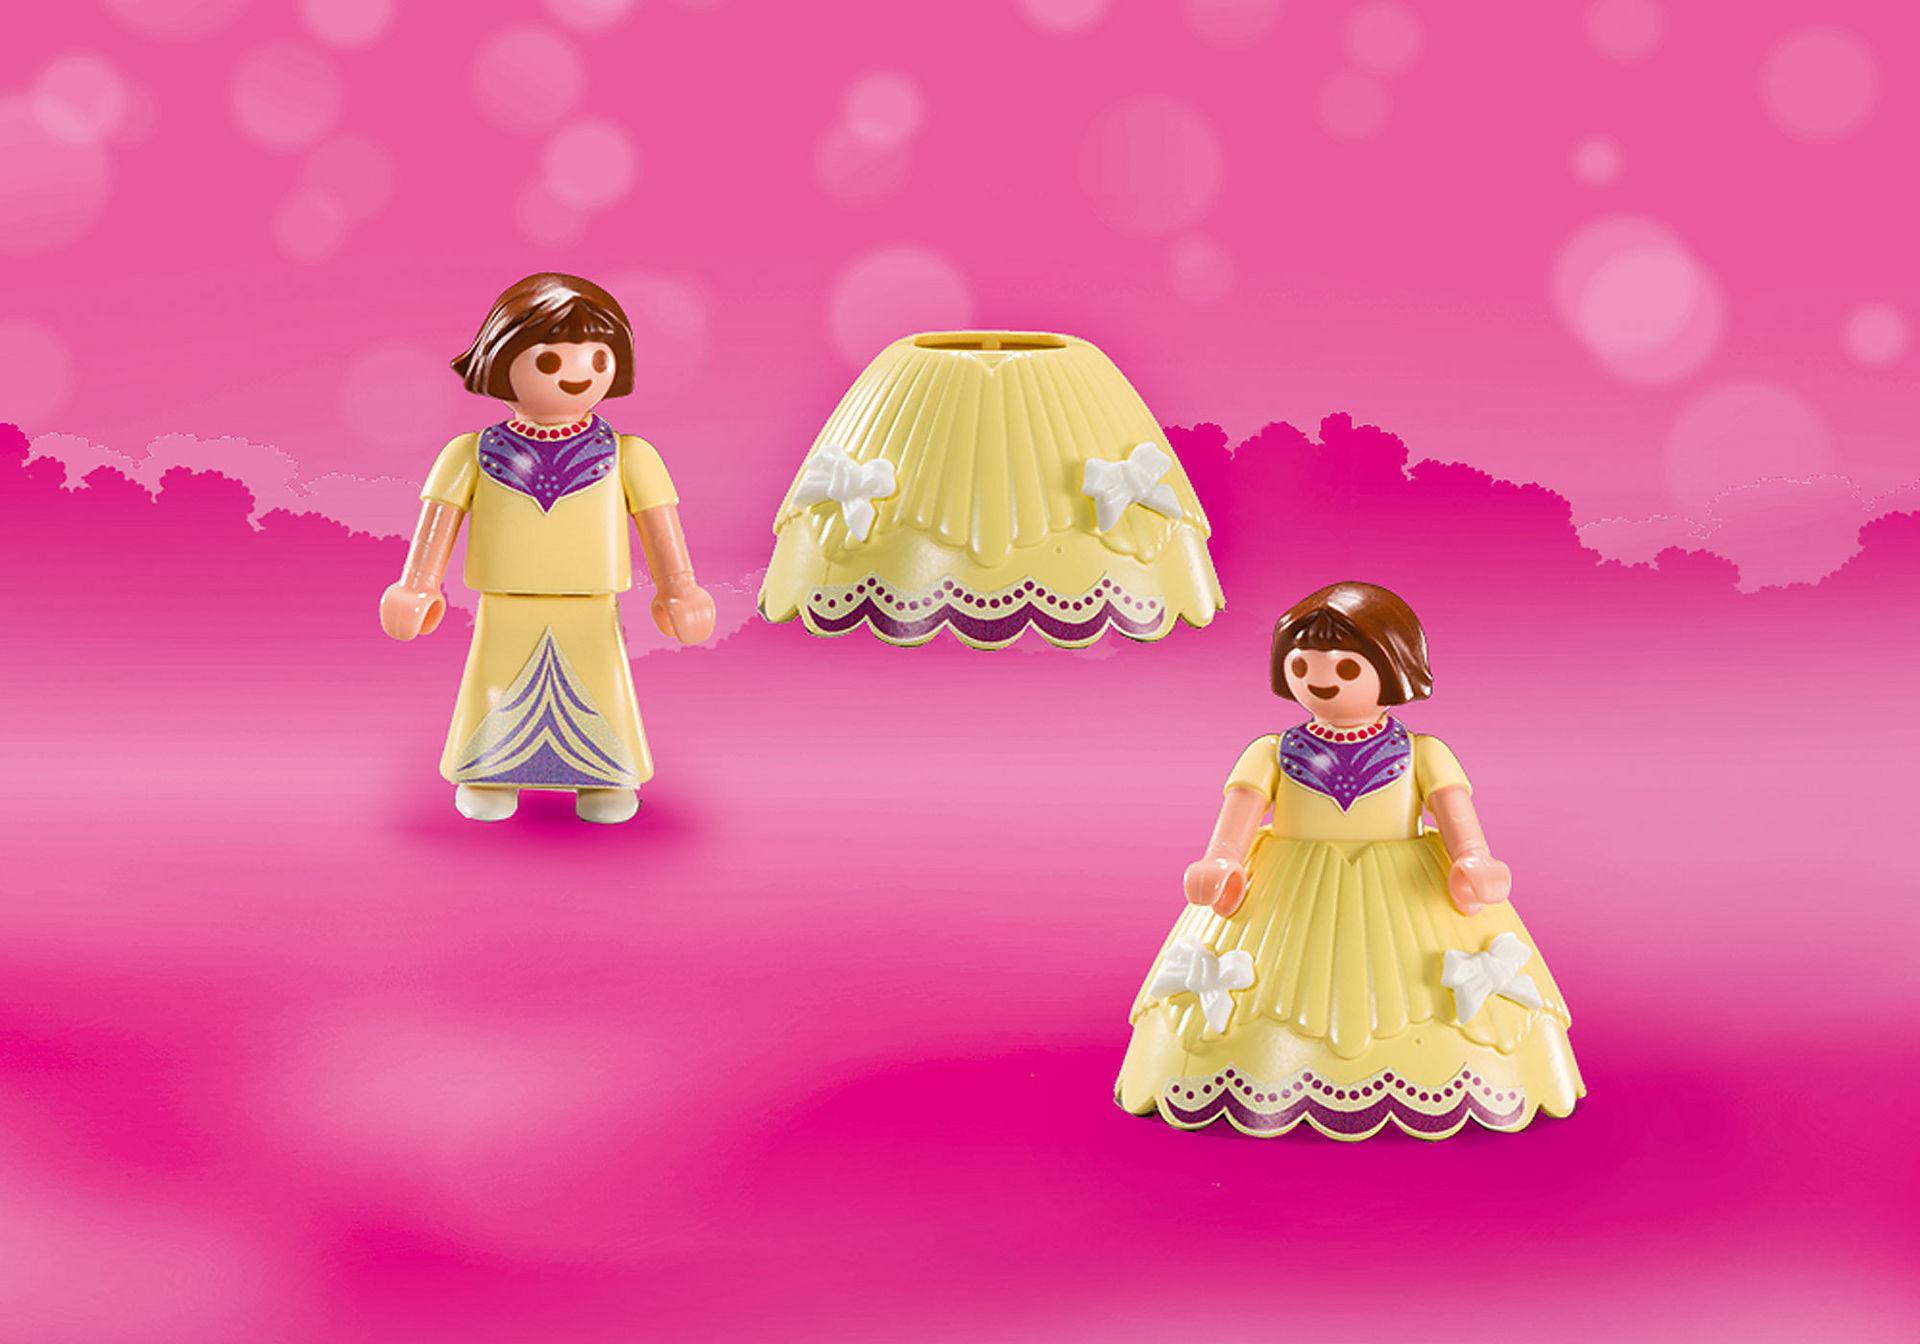 70107 Maletín grande Princesas y Unicornio zoom image5